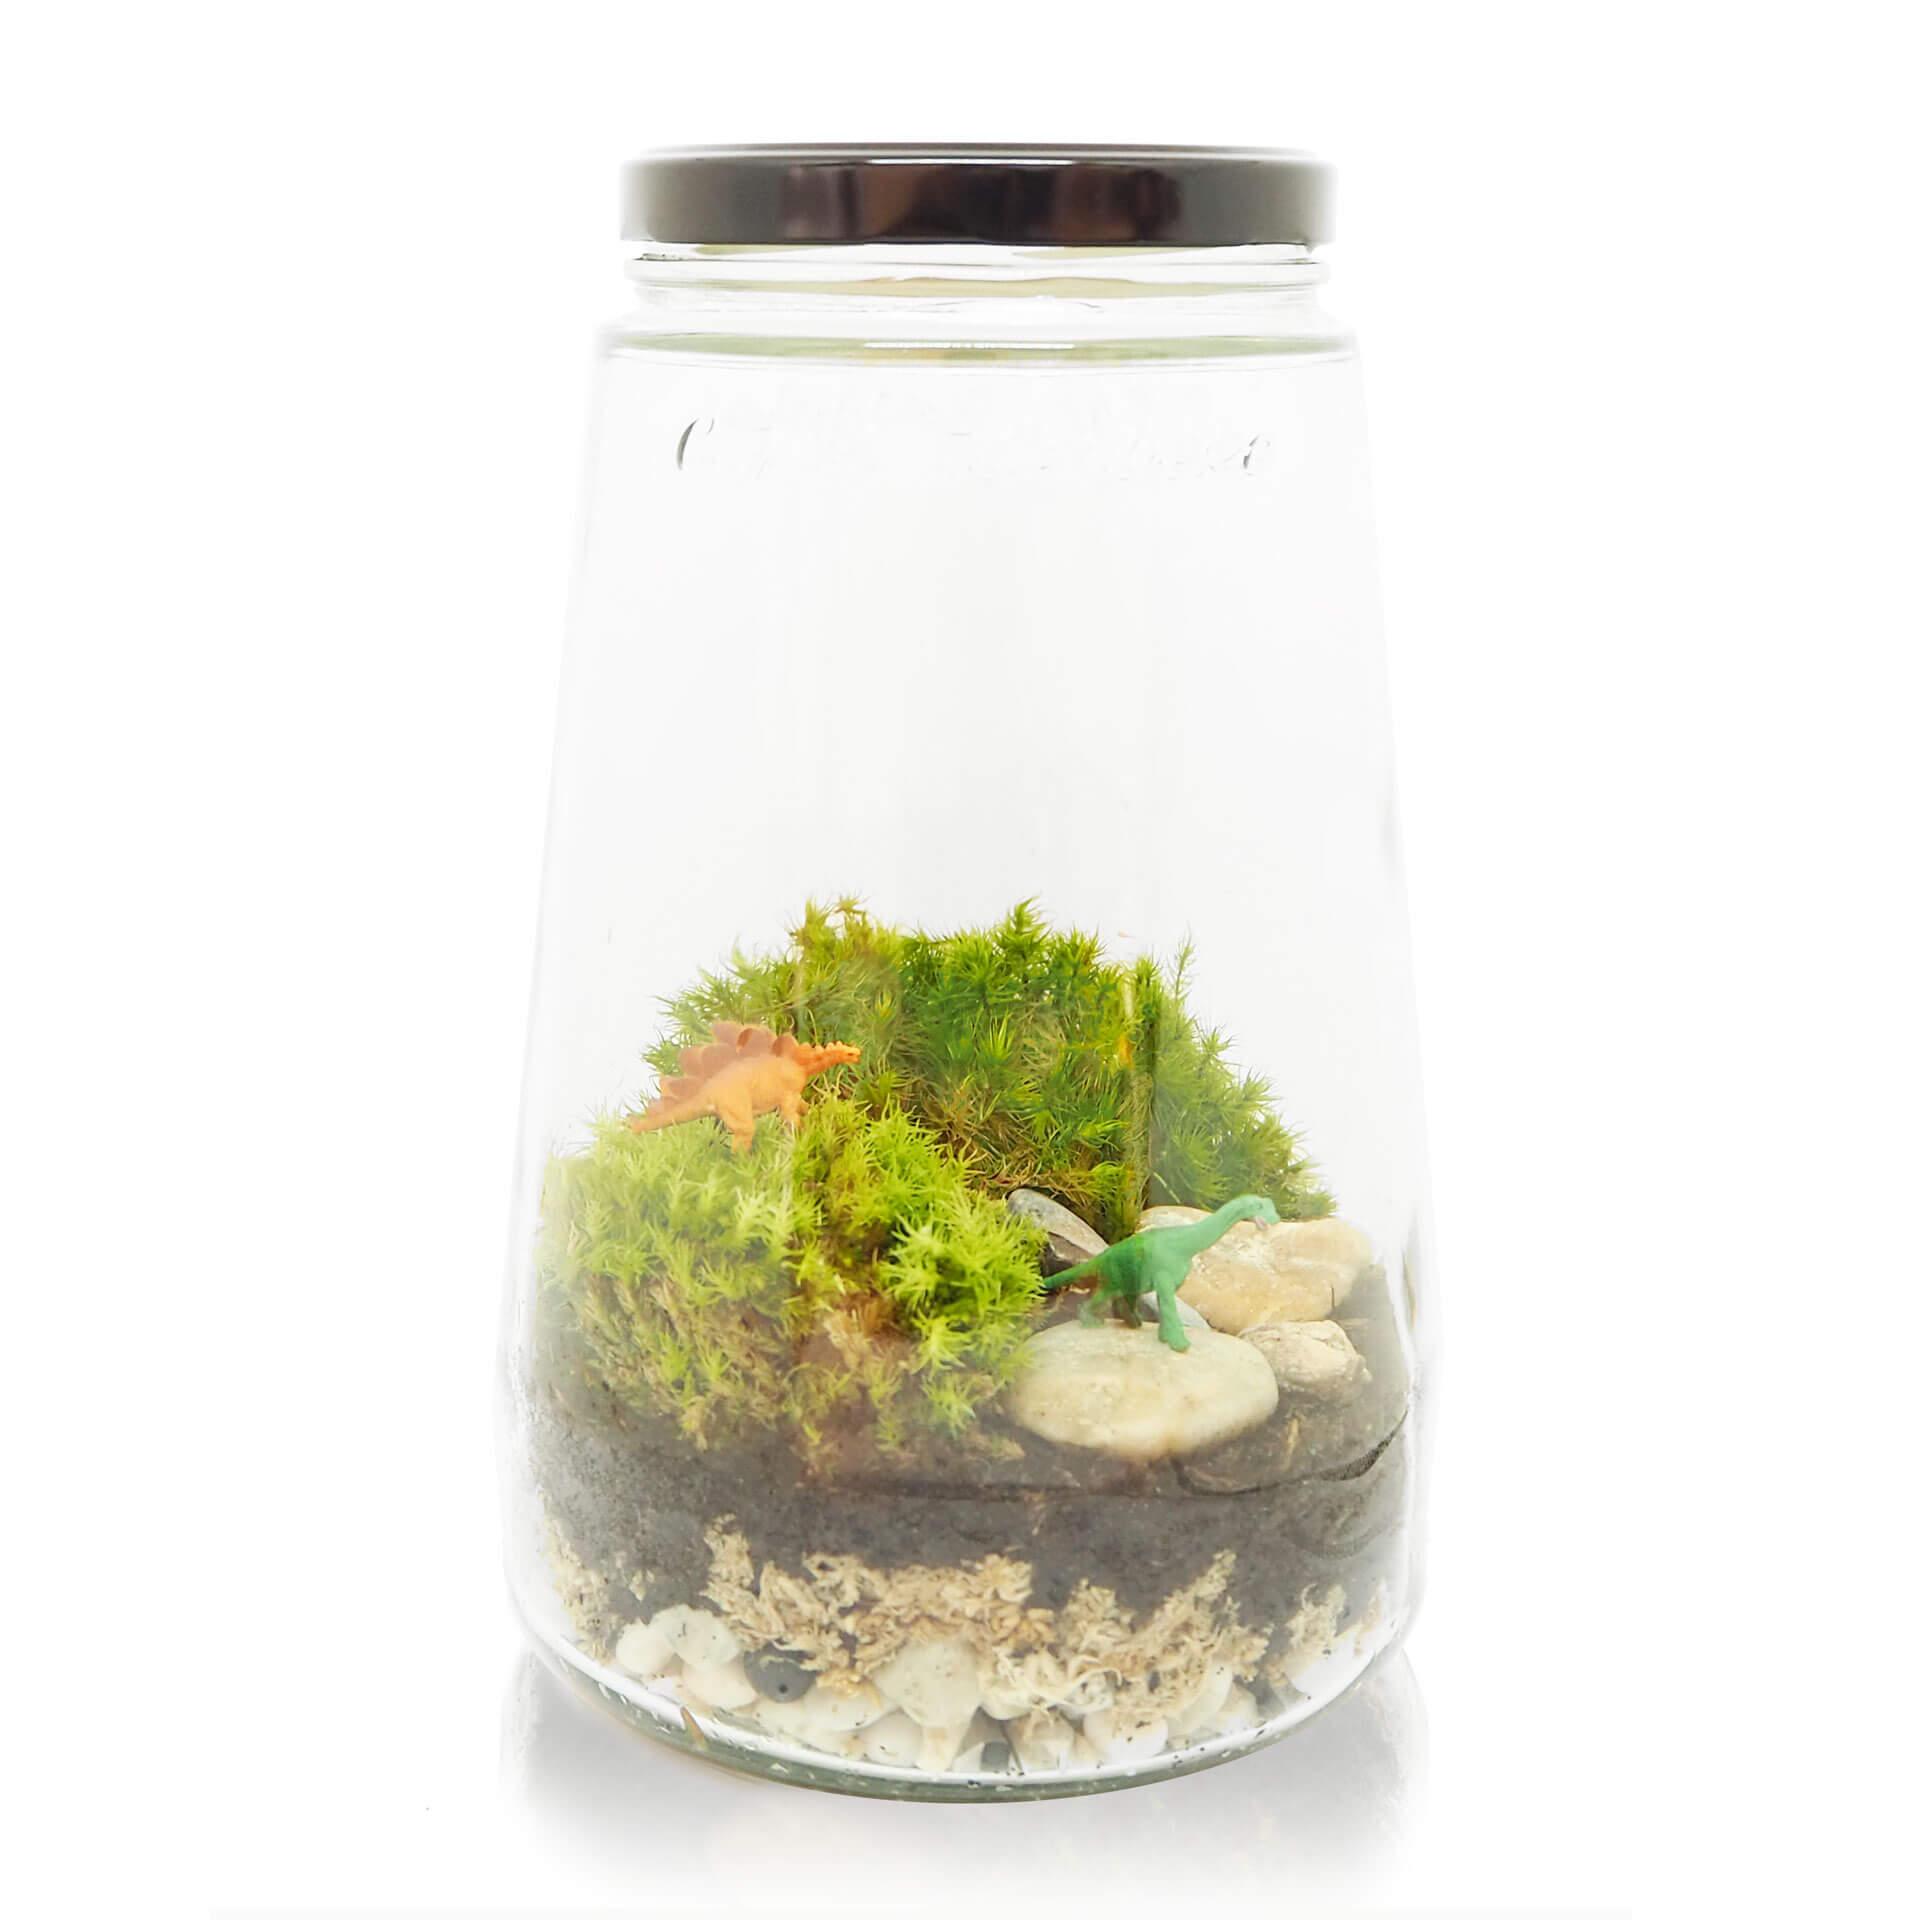 ecosysteem terrarium miniscape dino diy kit